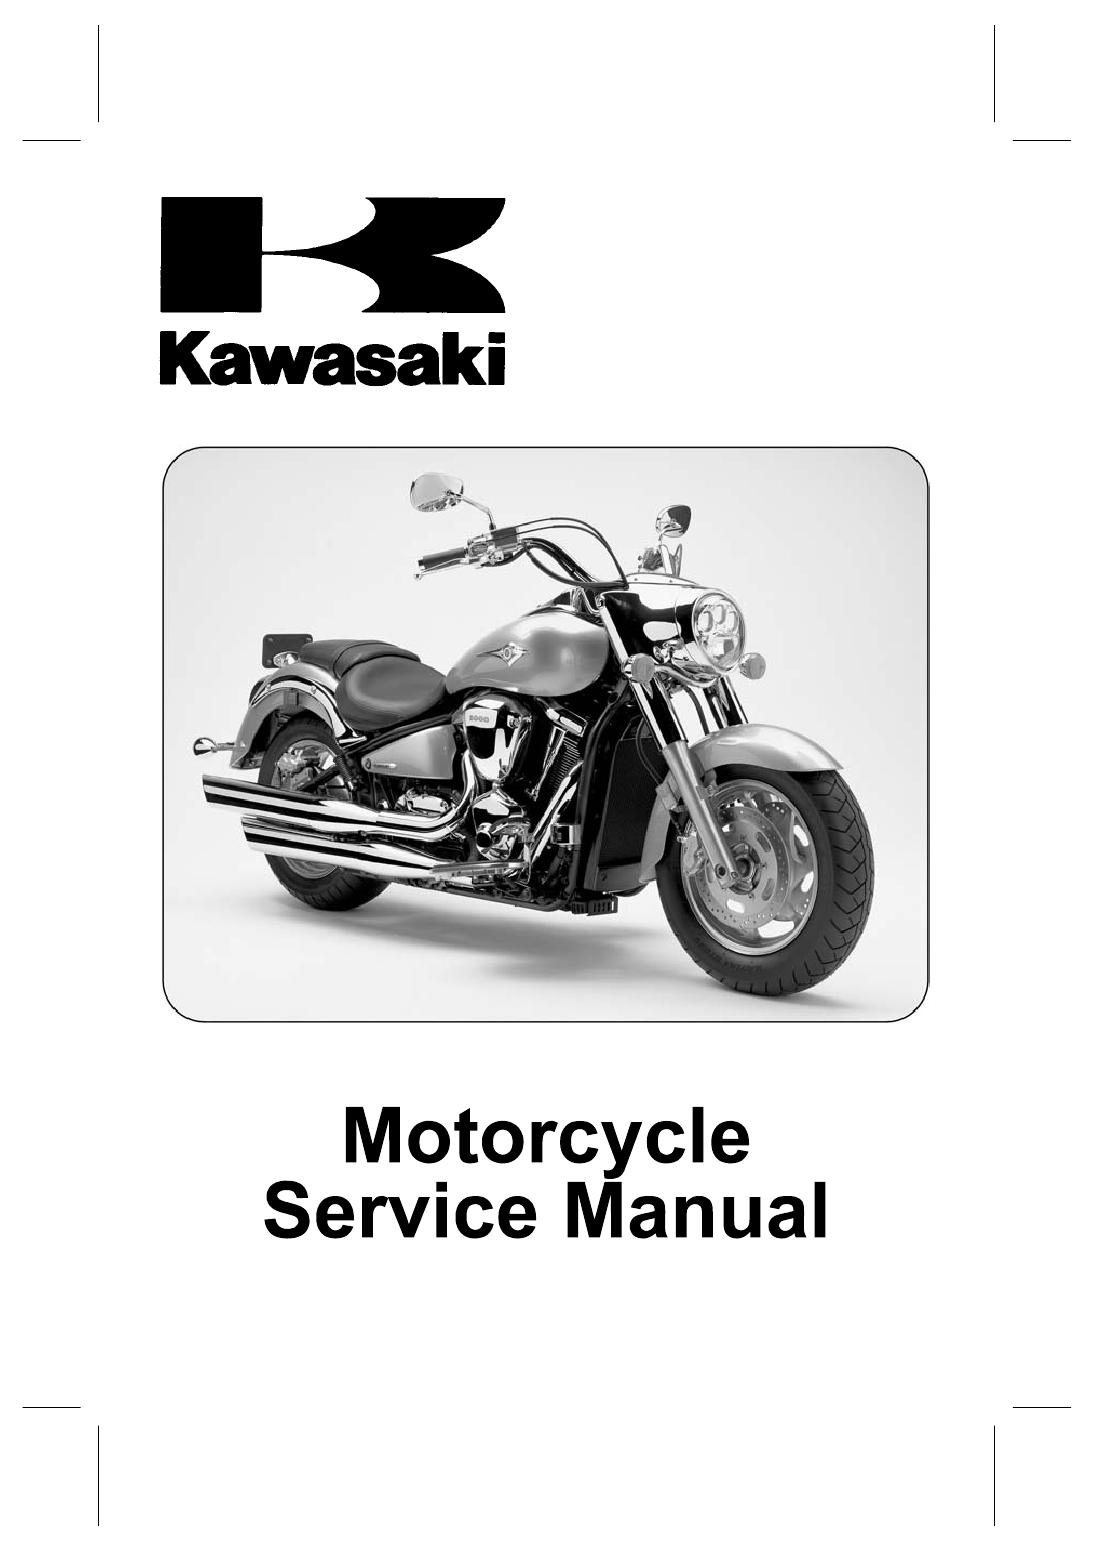 kawasaki vn2000 2003 vulcan rh manuals help ru